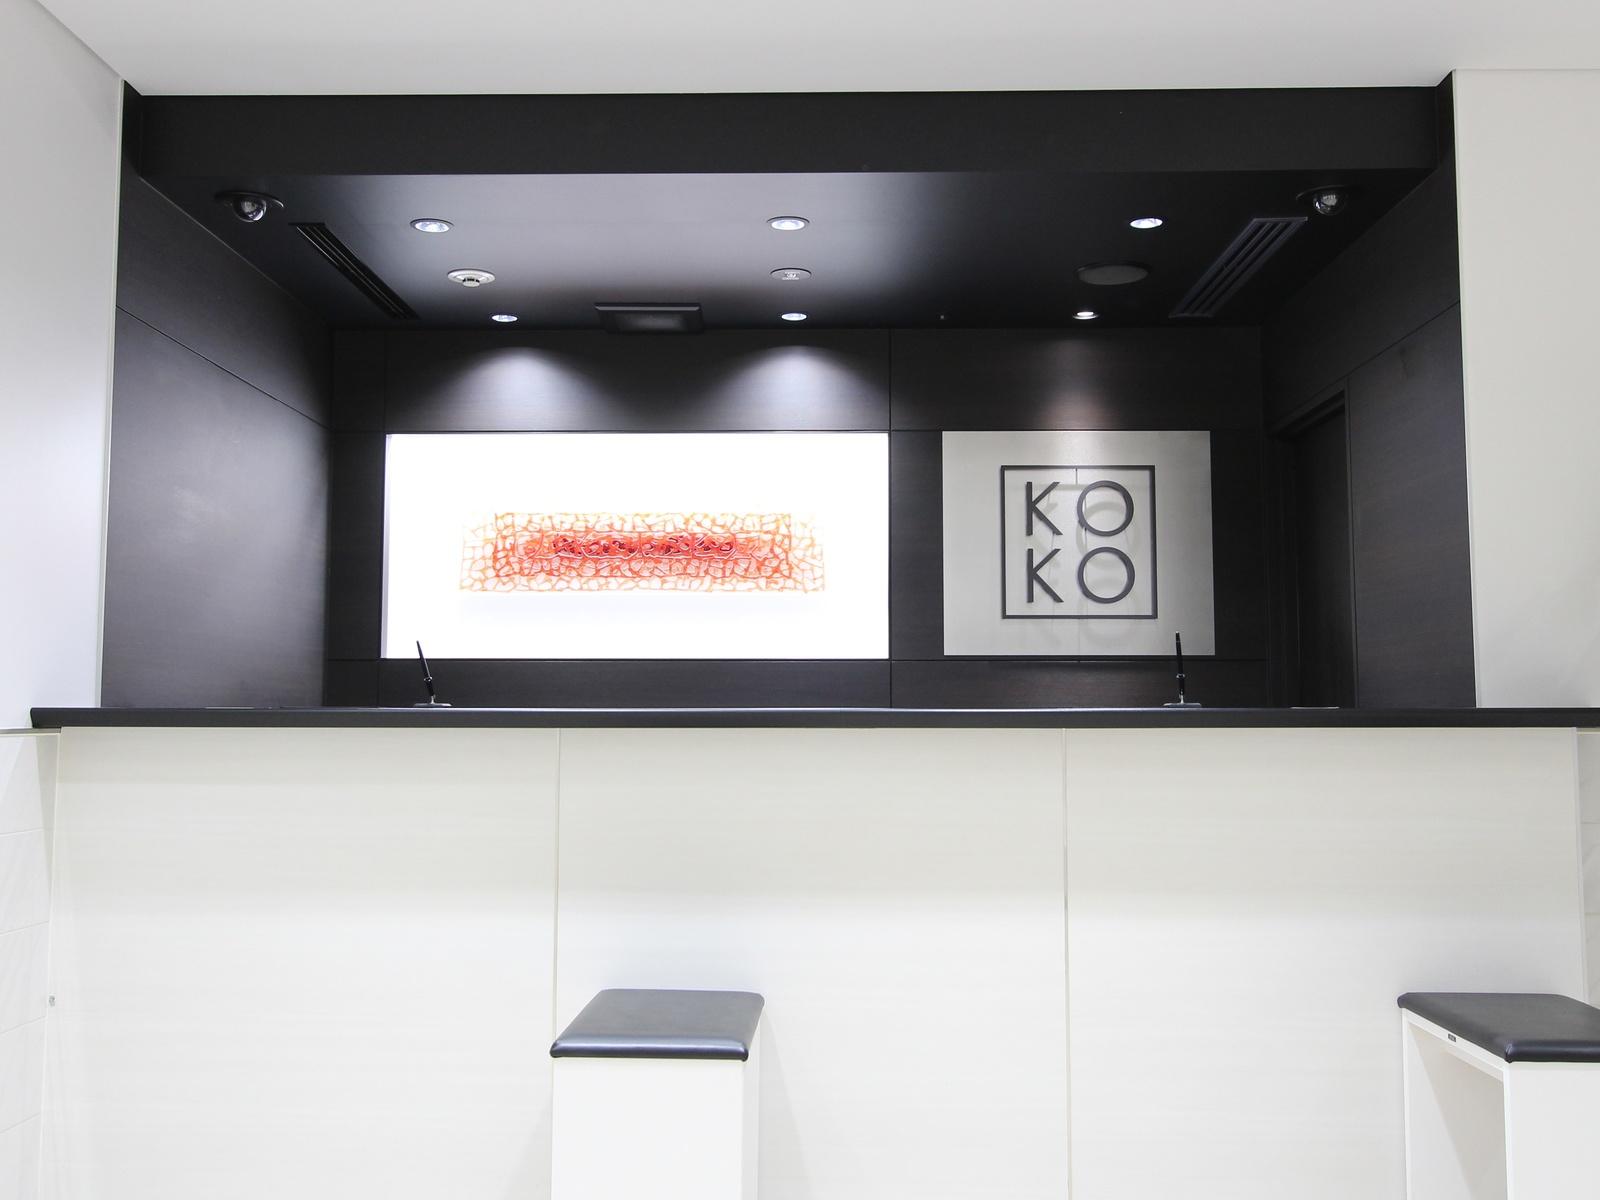 KOKO HOTEL 鹿児島天文館 / KOKO Hotels スタンダードプラン/ 素泊り